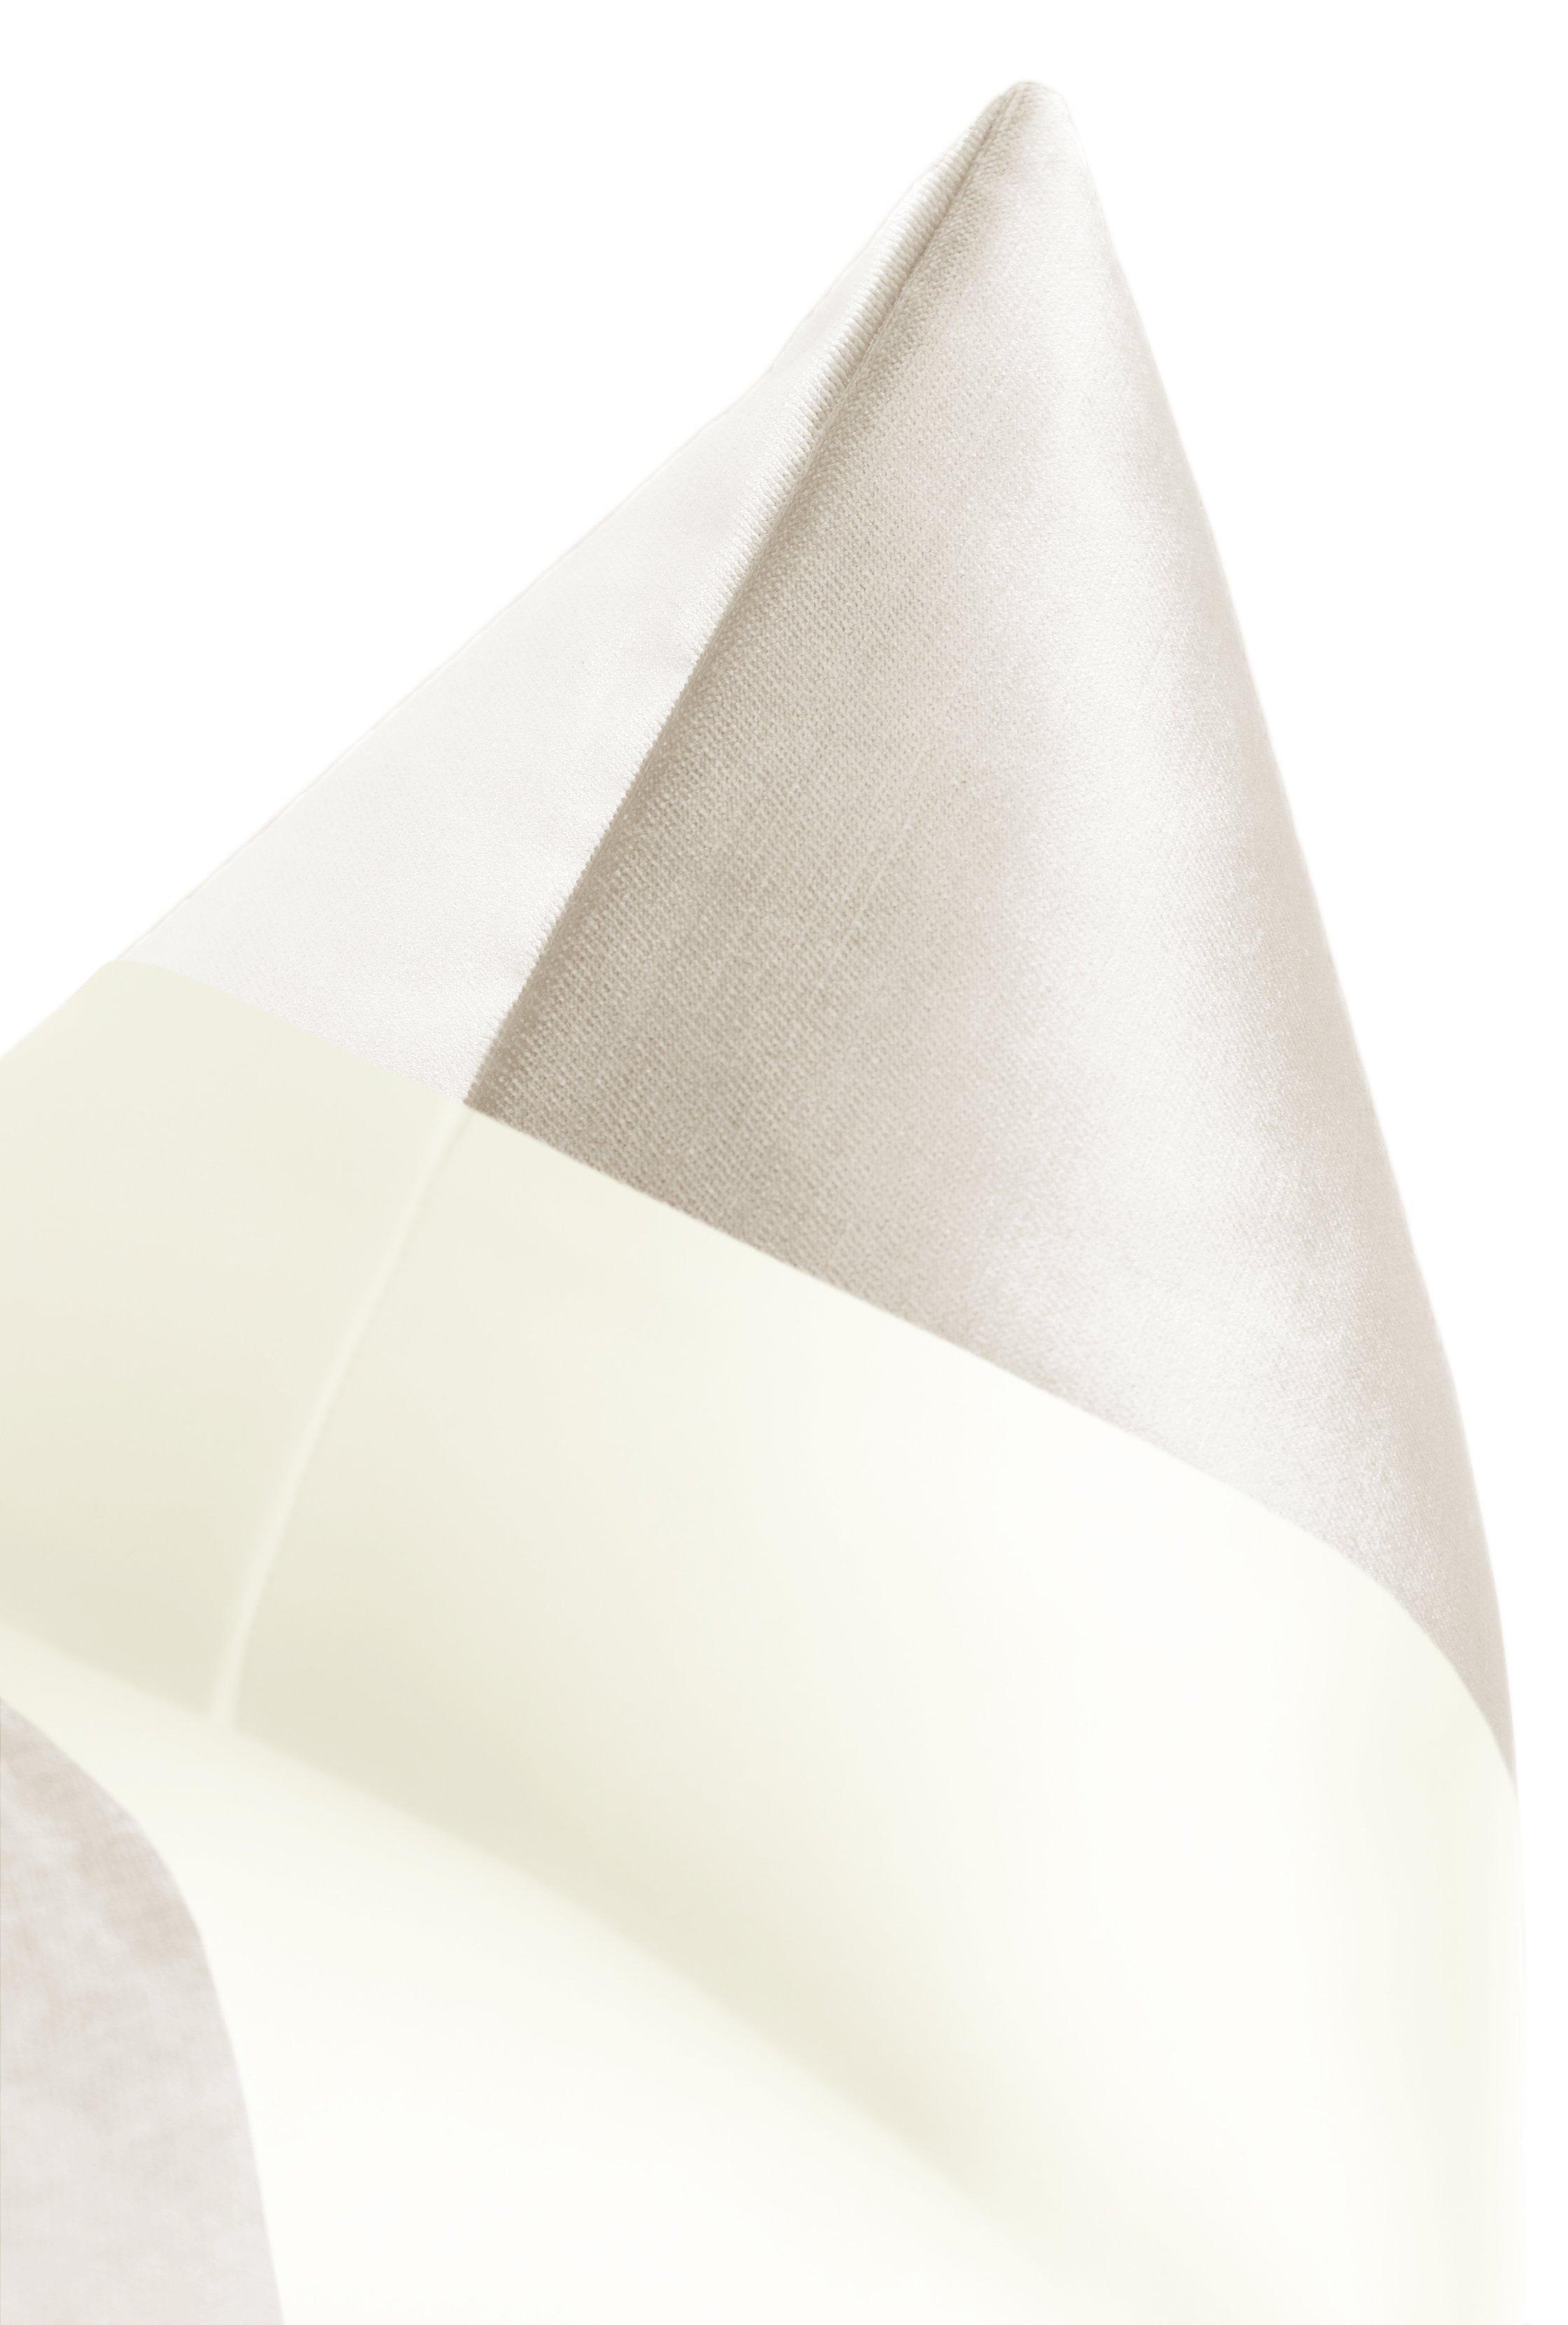 "PANEL Monochromatic :: Faux Silk Velvet // Alabaster - 20"" X 20"" Cover Only"